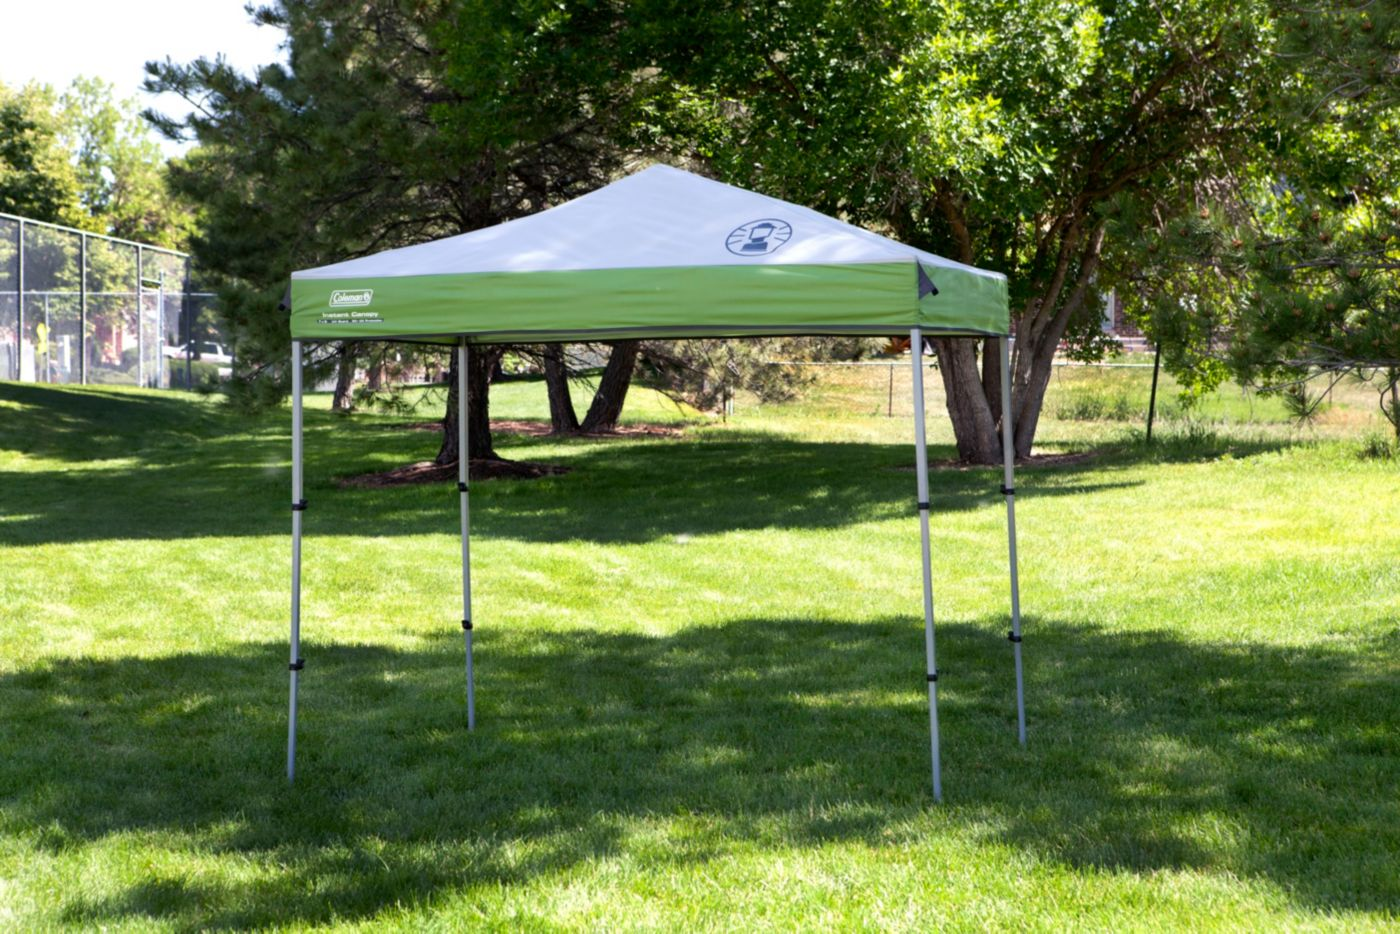 Instant Canopy image 1; 7 x 5 ft. Instant Canopy image 2 ...  sc 1 st  Coleman & 7 x 5 ft. Instant Canopy | Coleman